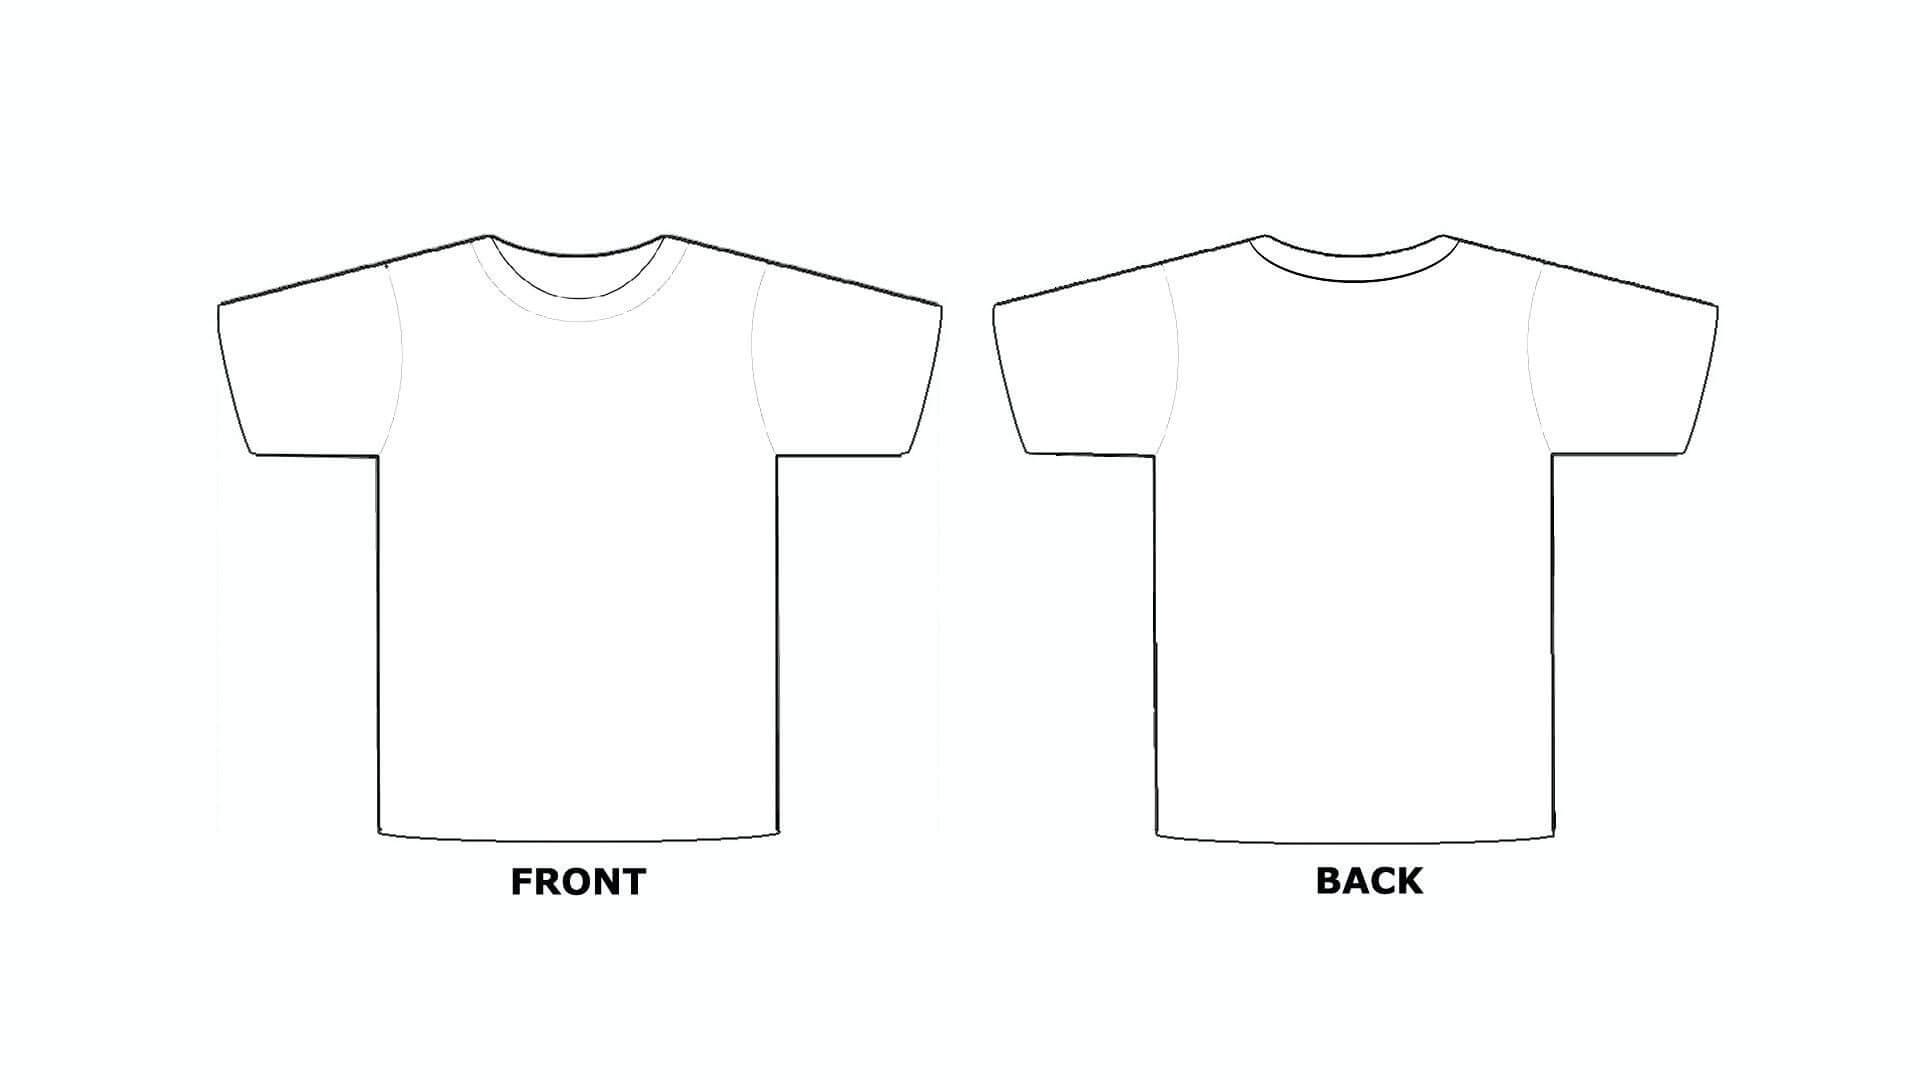 Printable Blank Tshirt Template - C Punkt Regarding Blank Tshirt Template Pdf